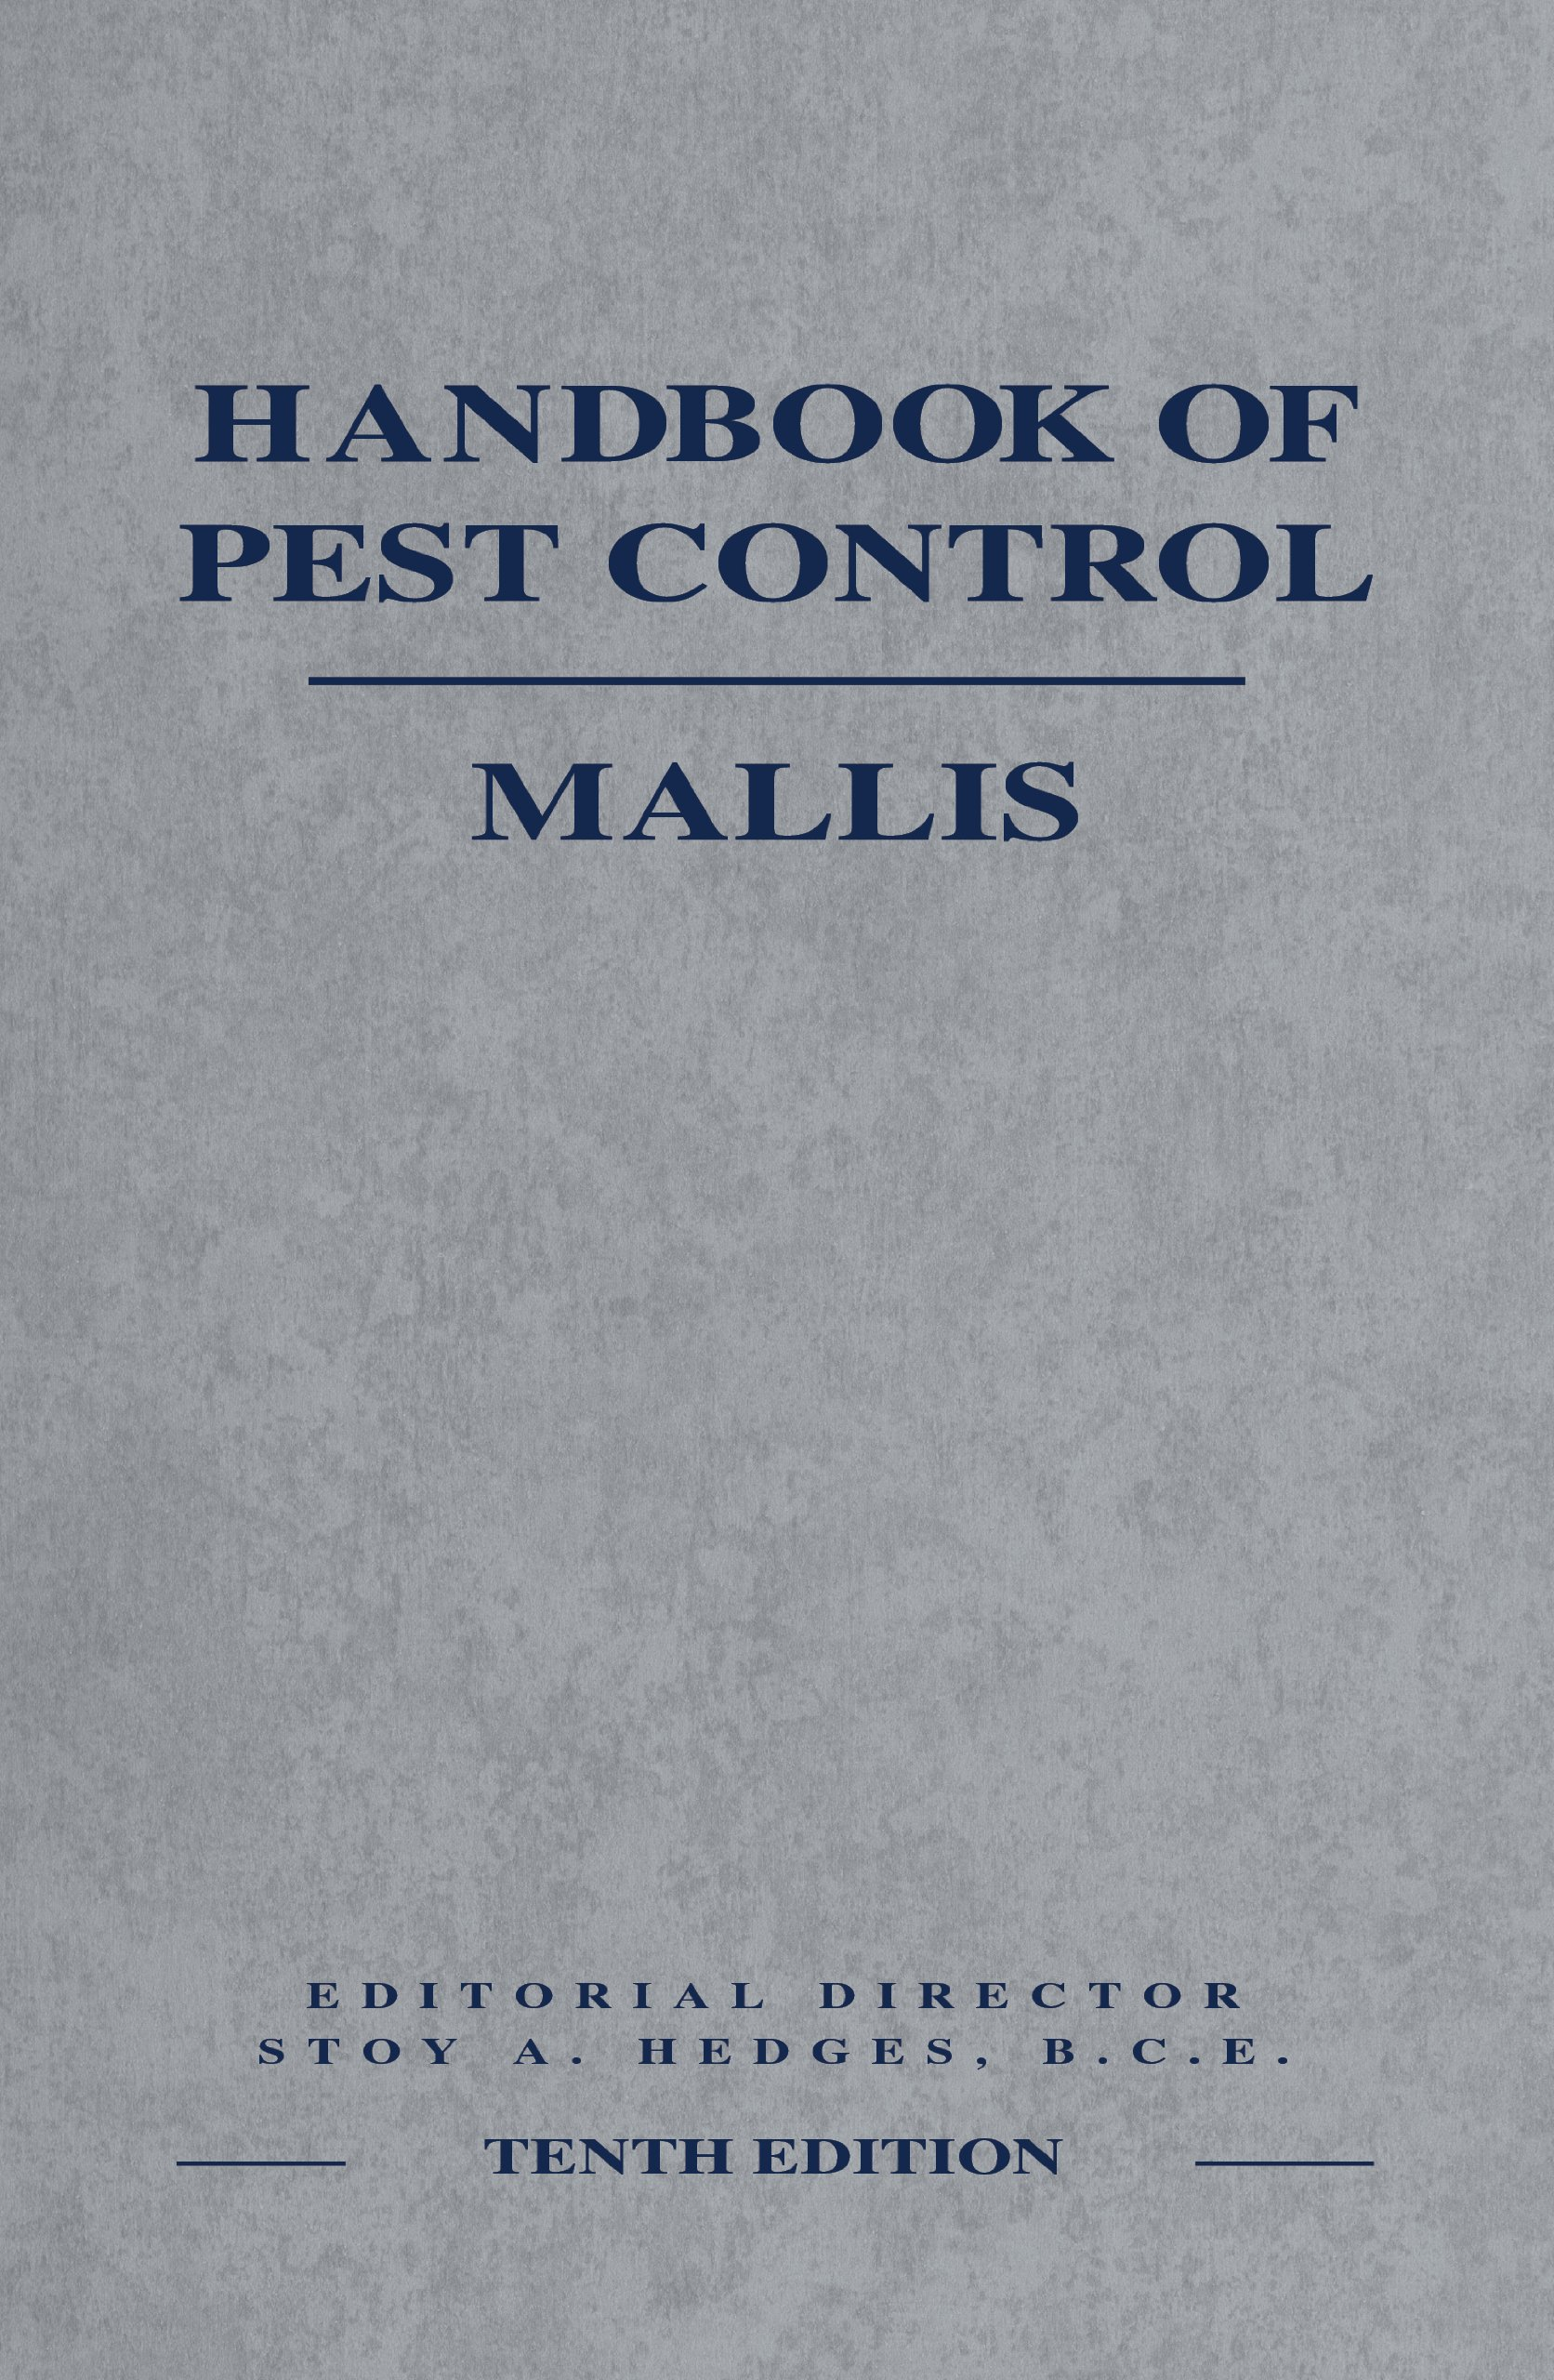 The Mallis Handbook of Pest Control, 10th Edition